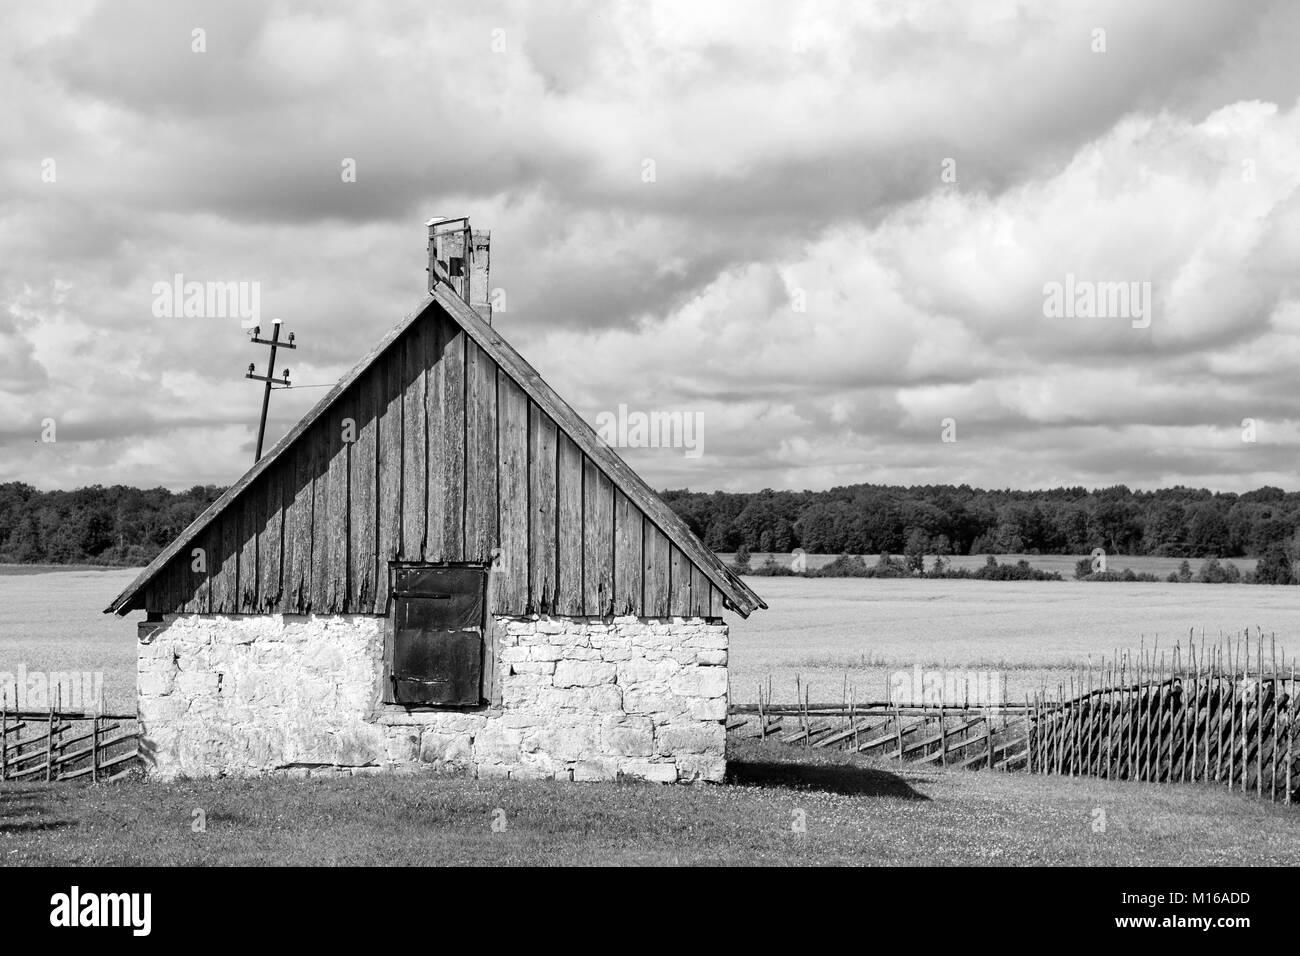 Old Farmhouse in Angla Heritage Culture Center at Saaremma island, Estonia - Stock Image